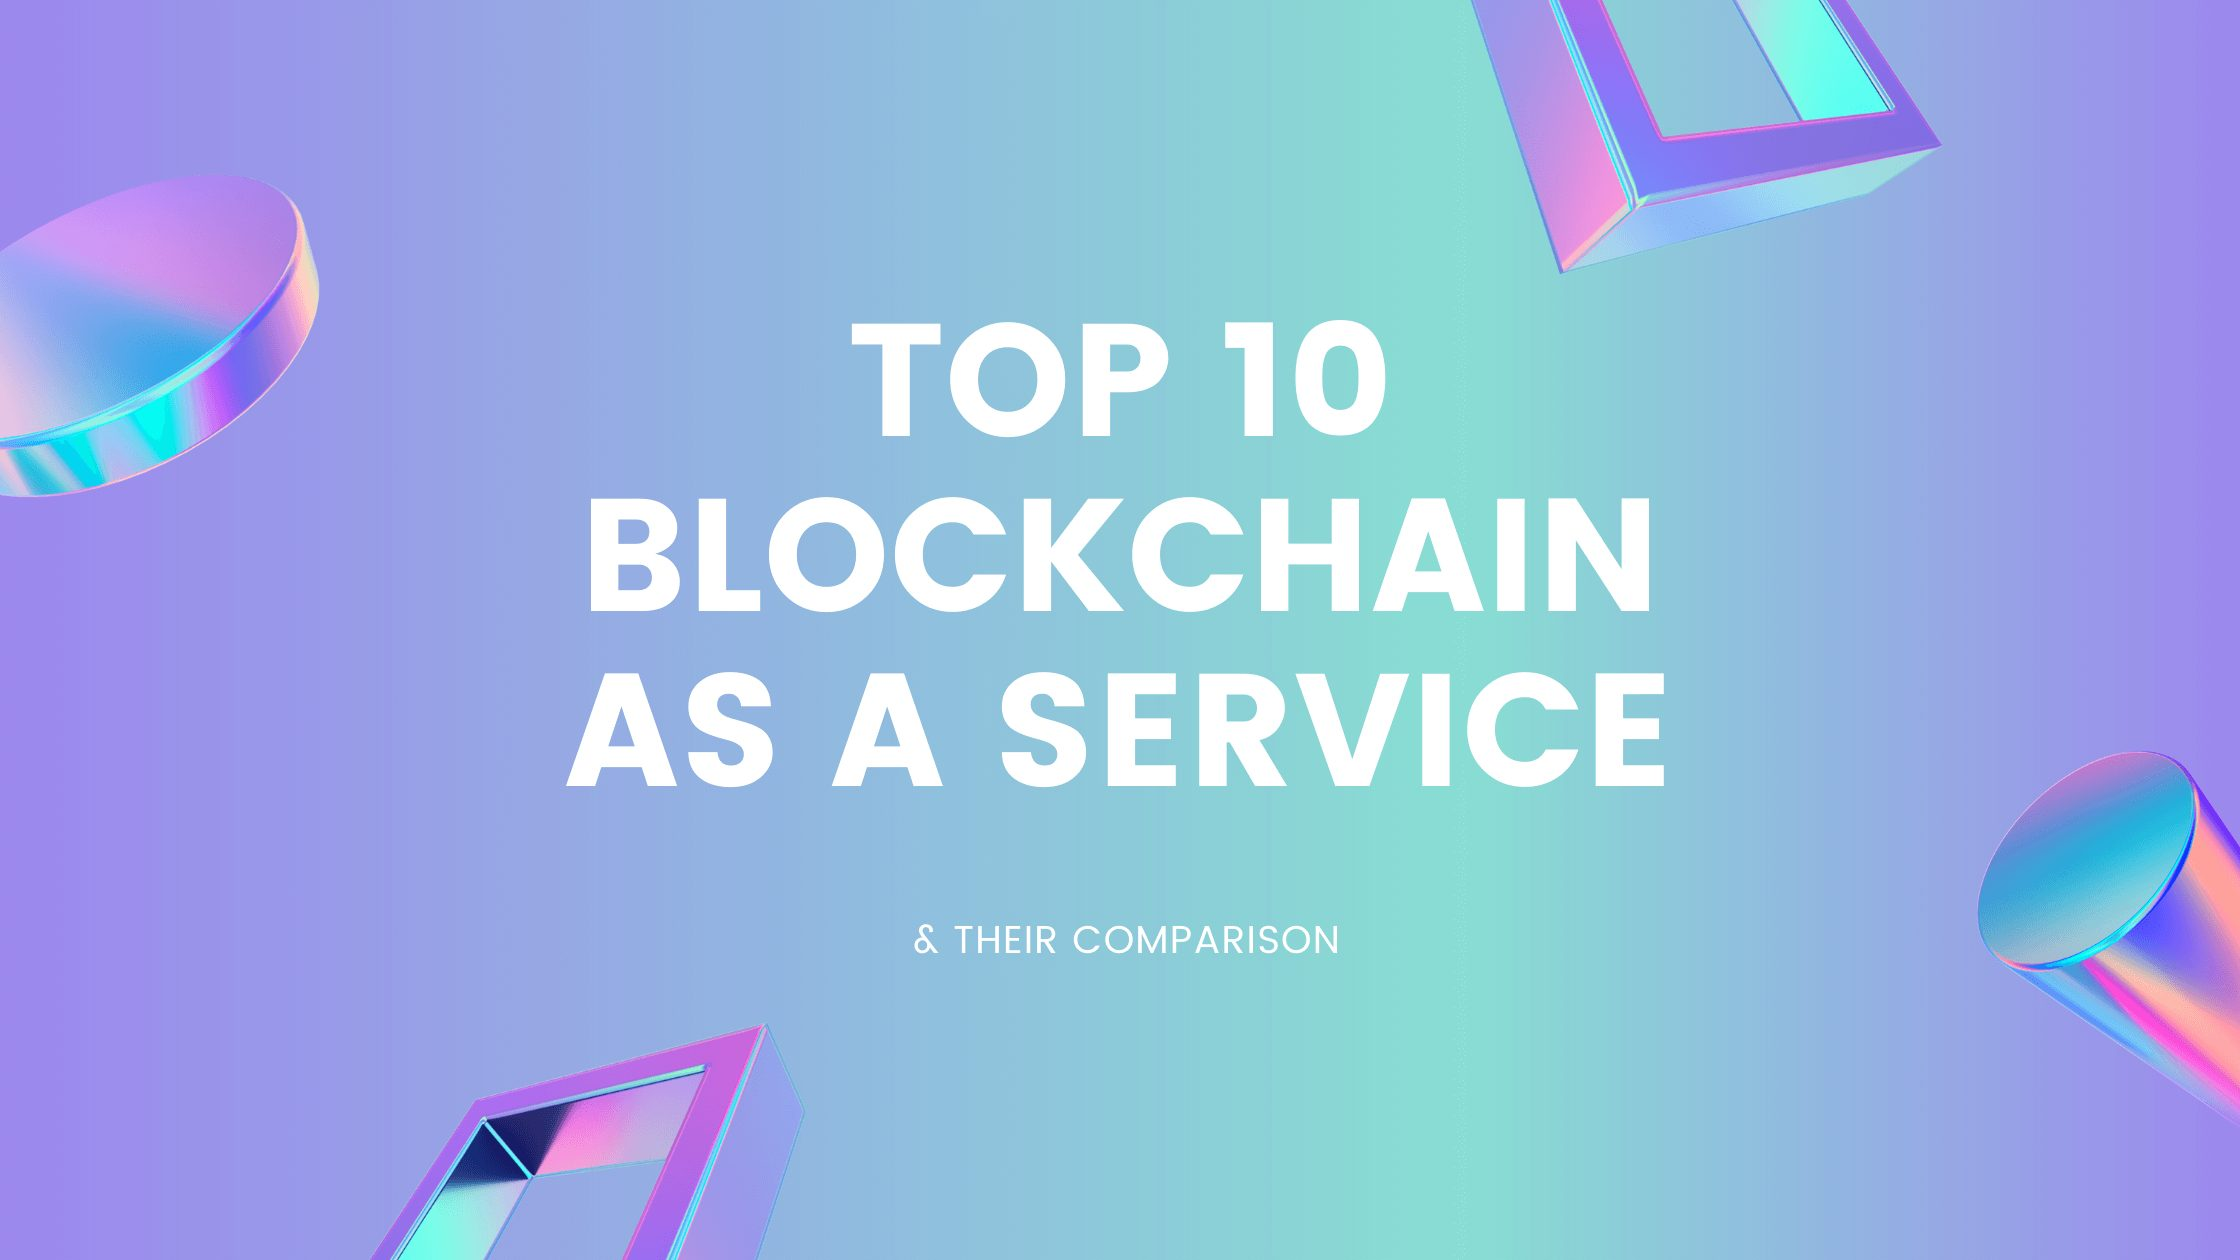 Top 10 Blockchain as a service